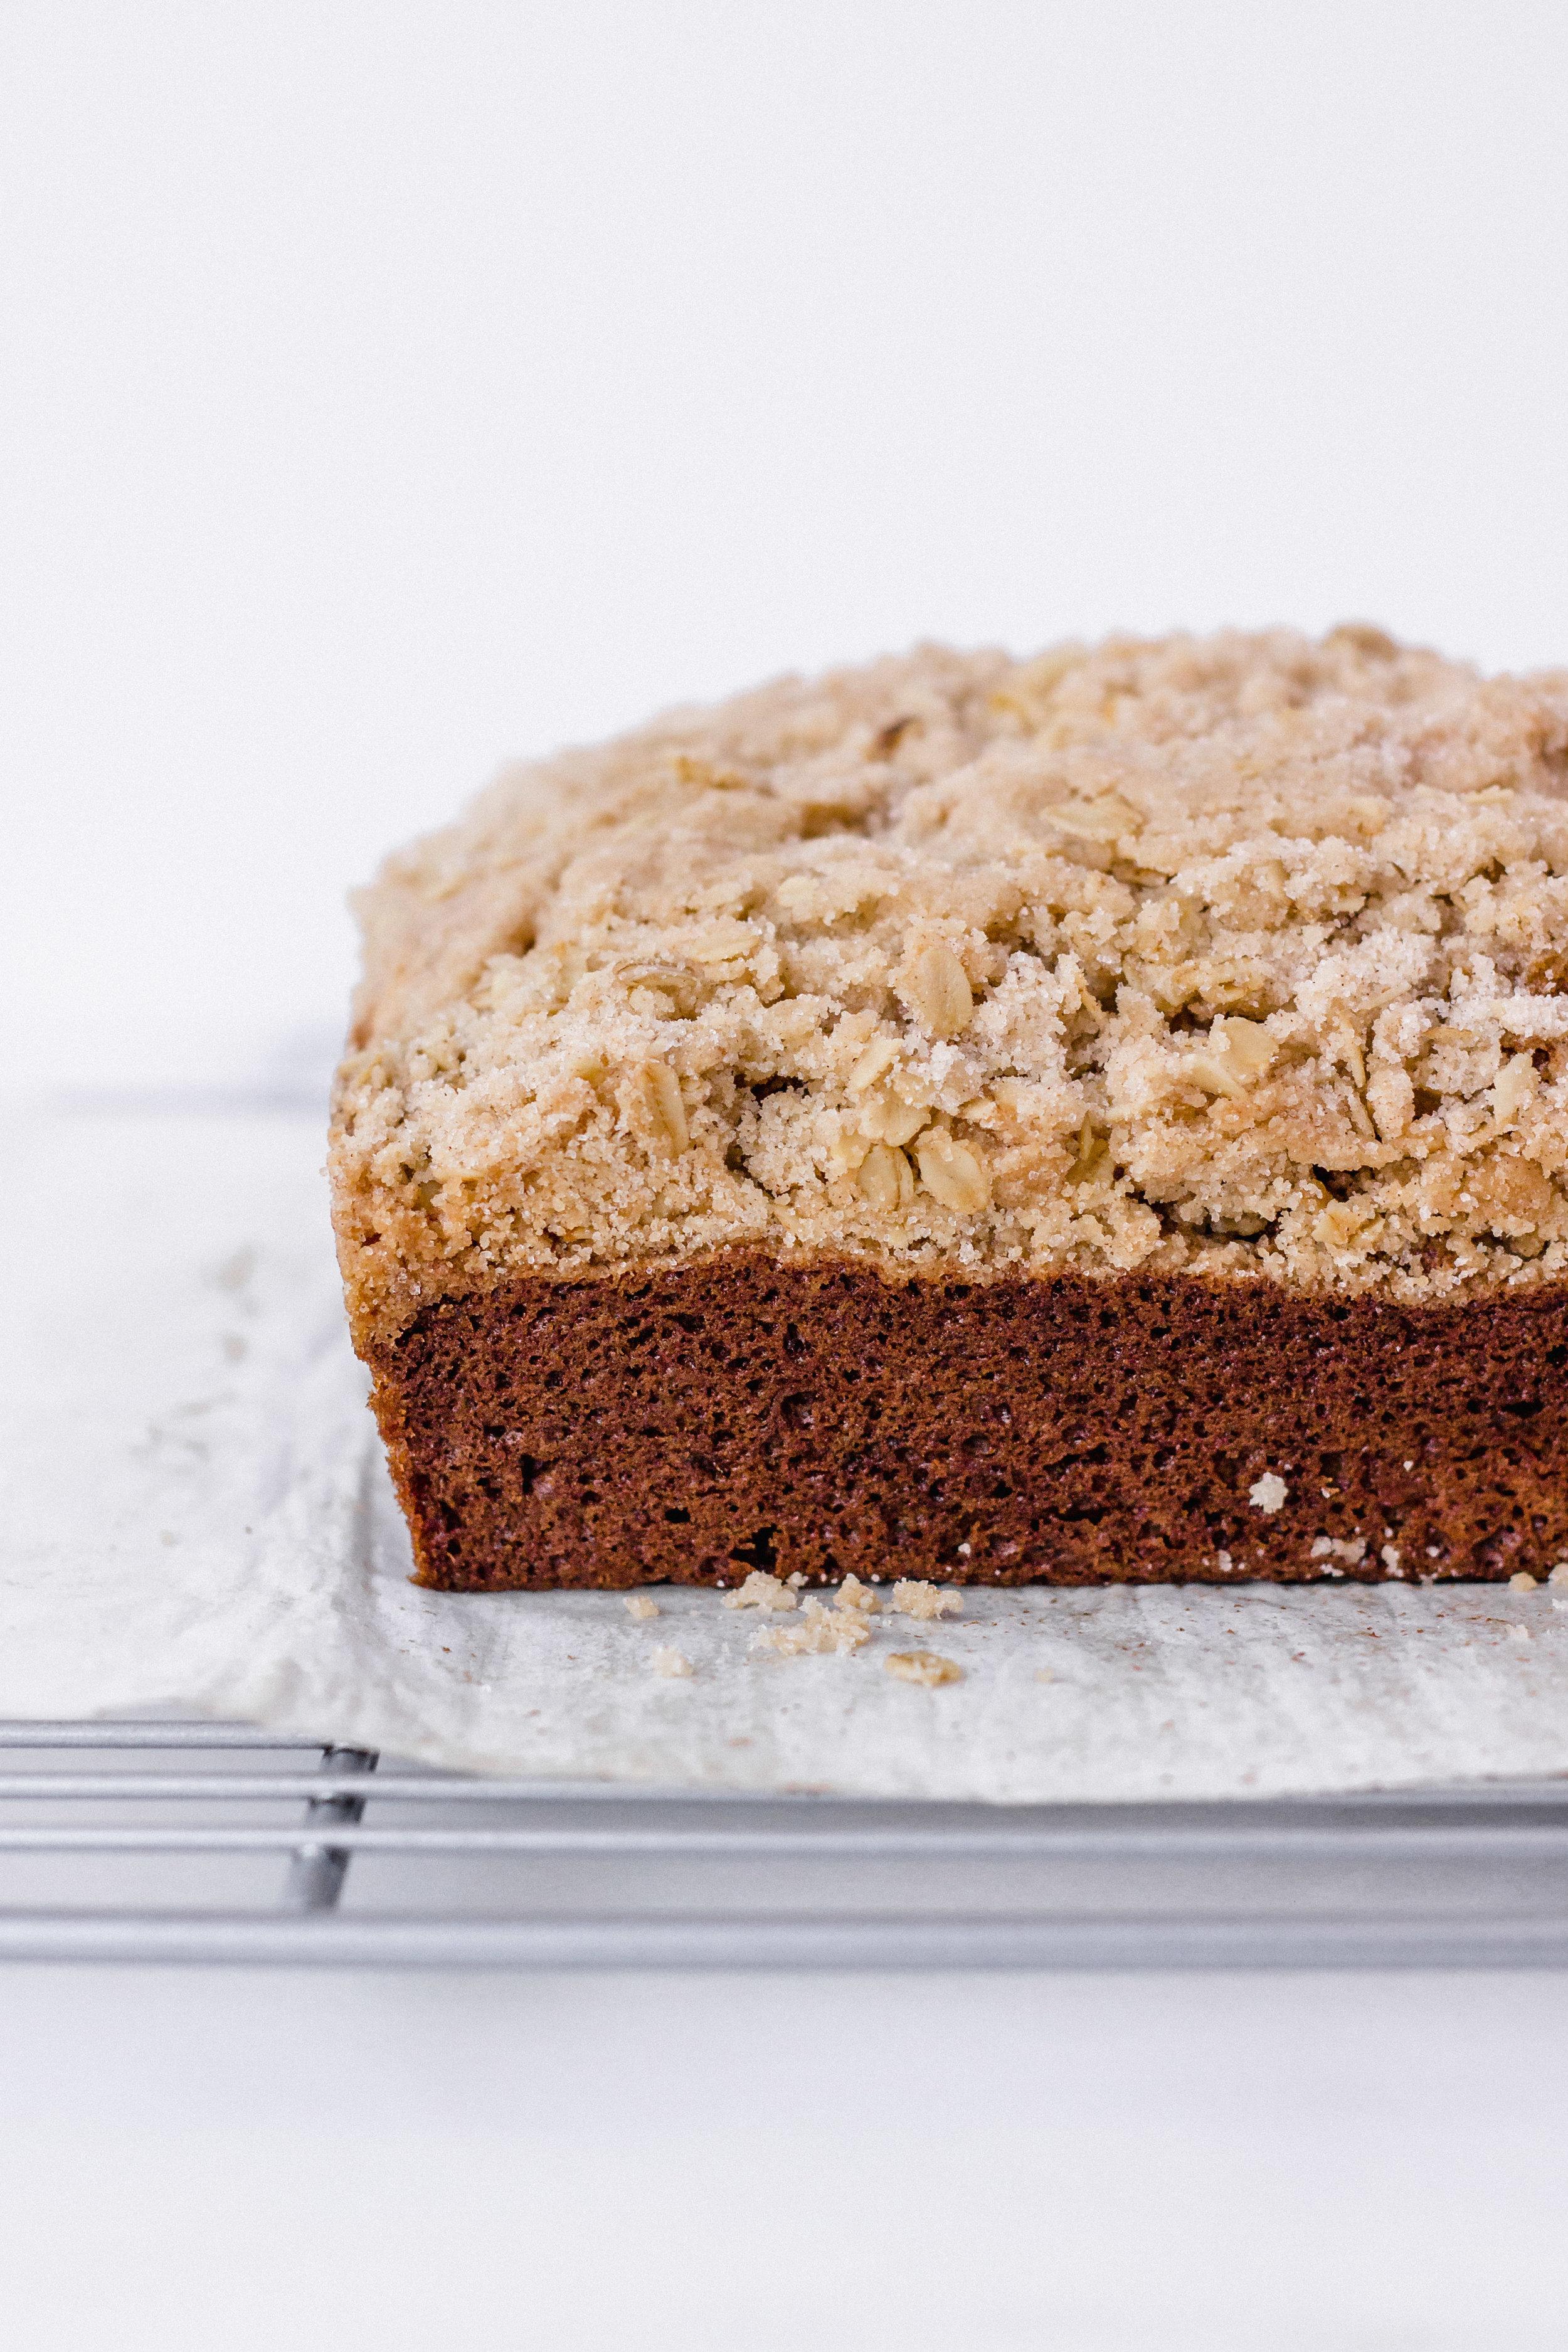 zucchini_bread_streusel_topping-2.jpg